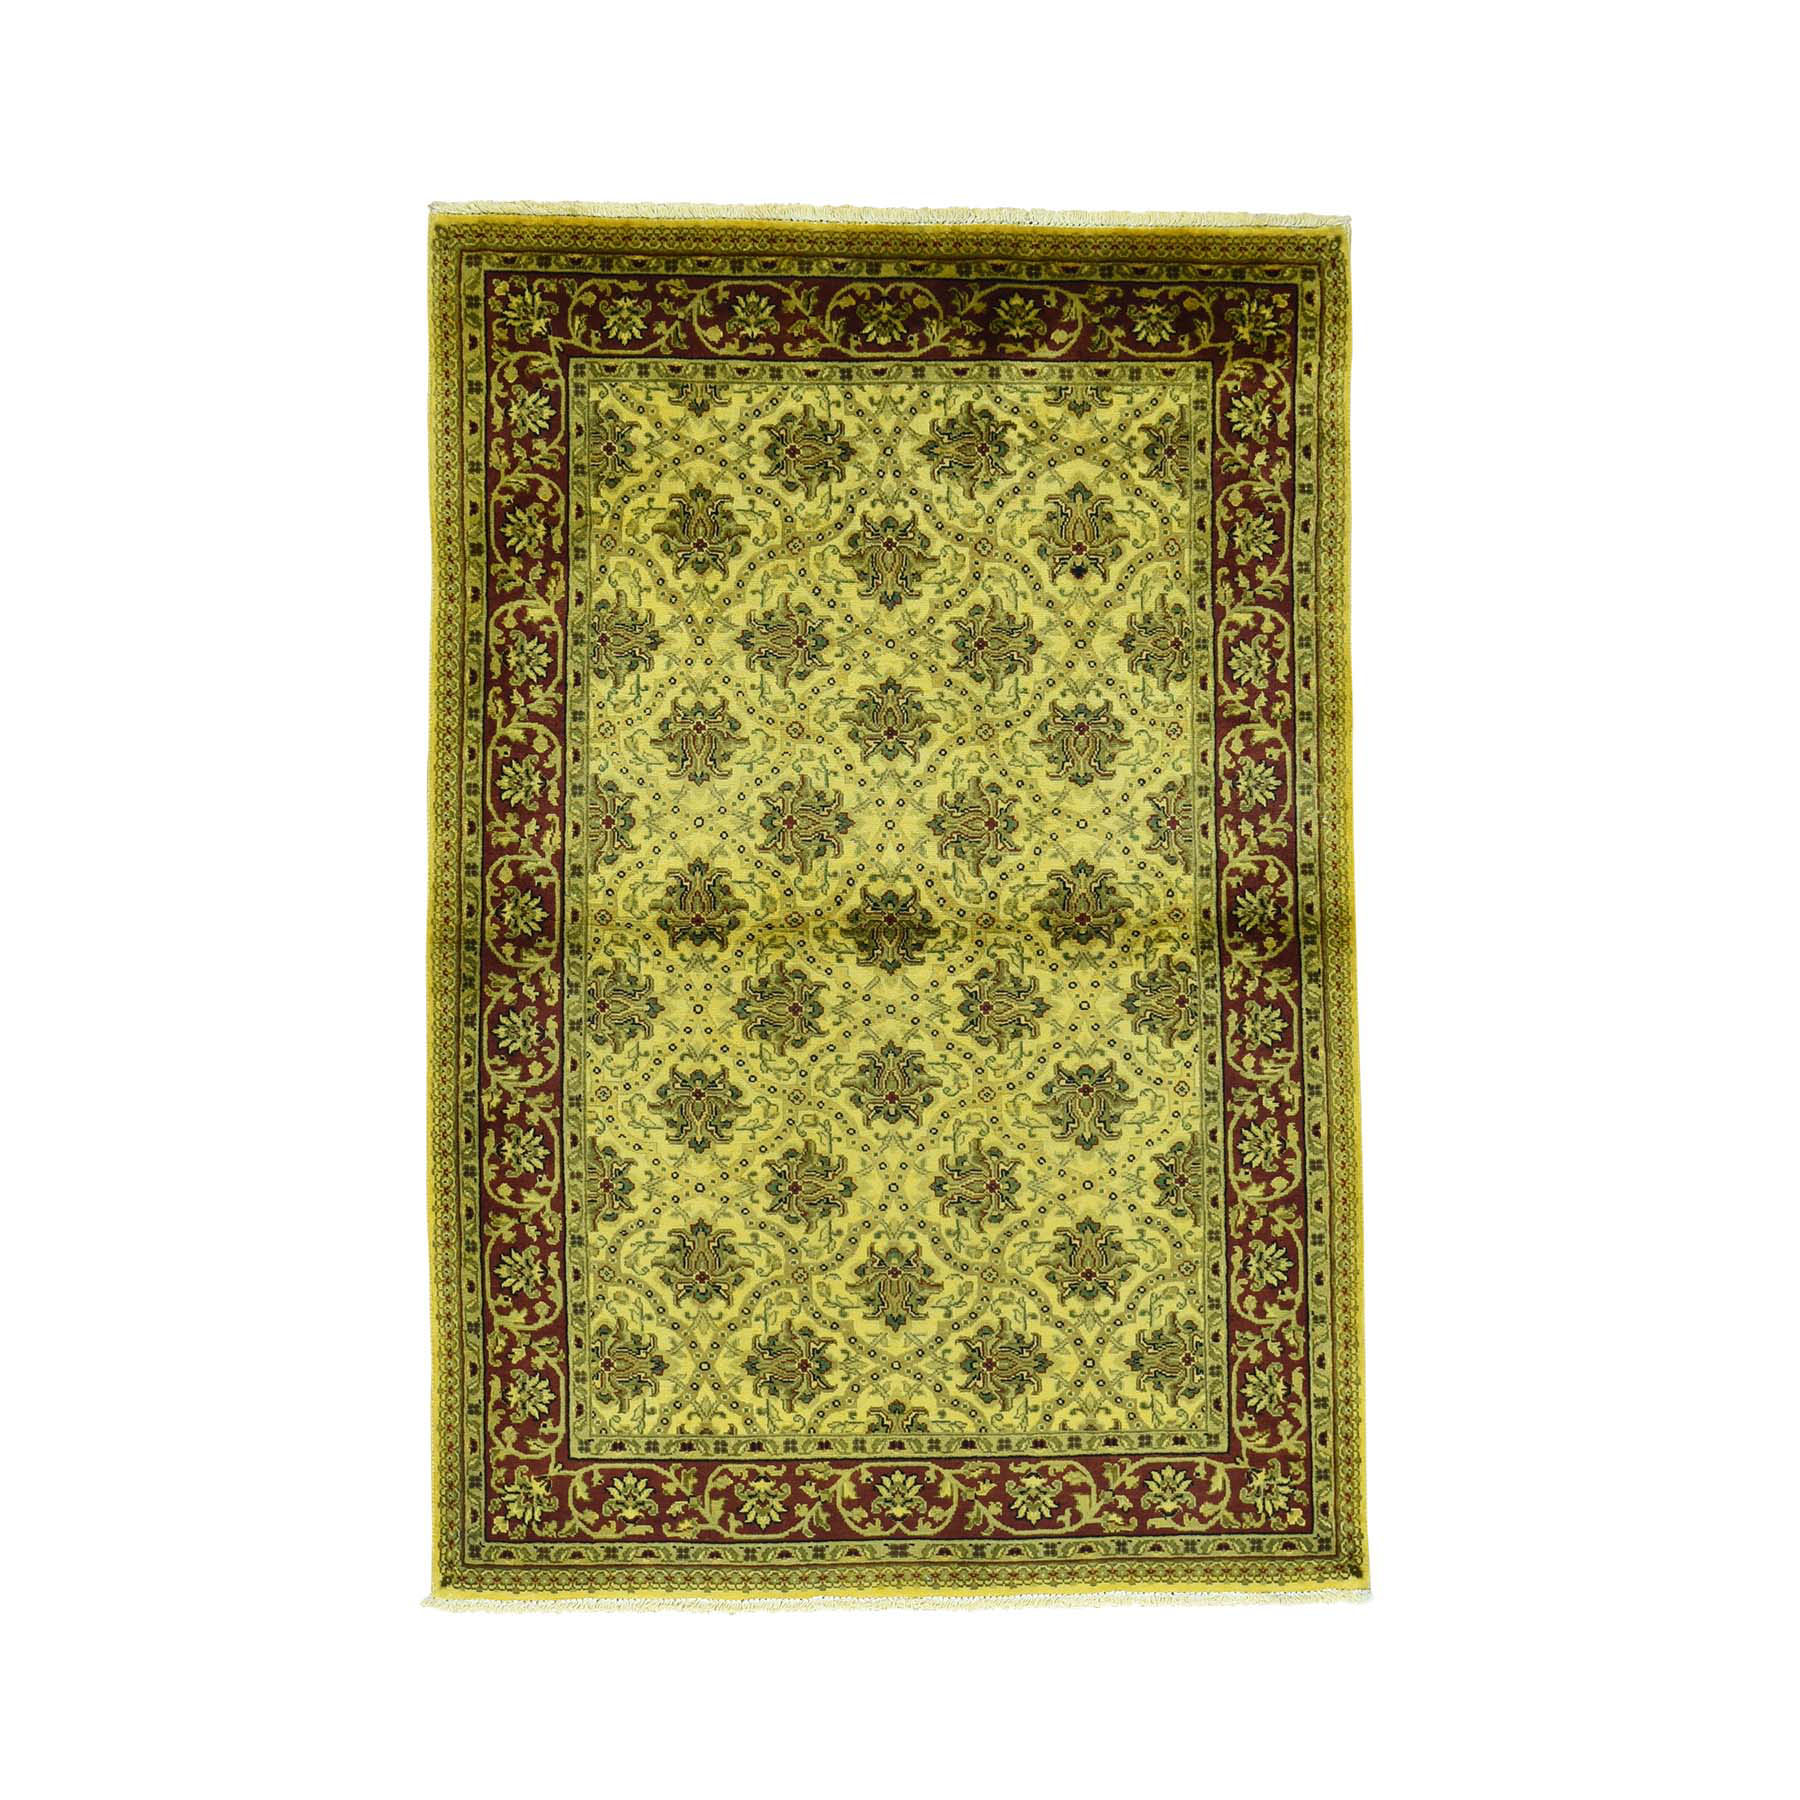 "4'X5'10"" Handmade Pure Wool Overdyed Persian Herati Vintage Oriental Rug moaca980"